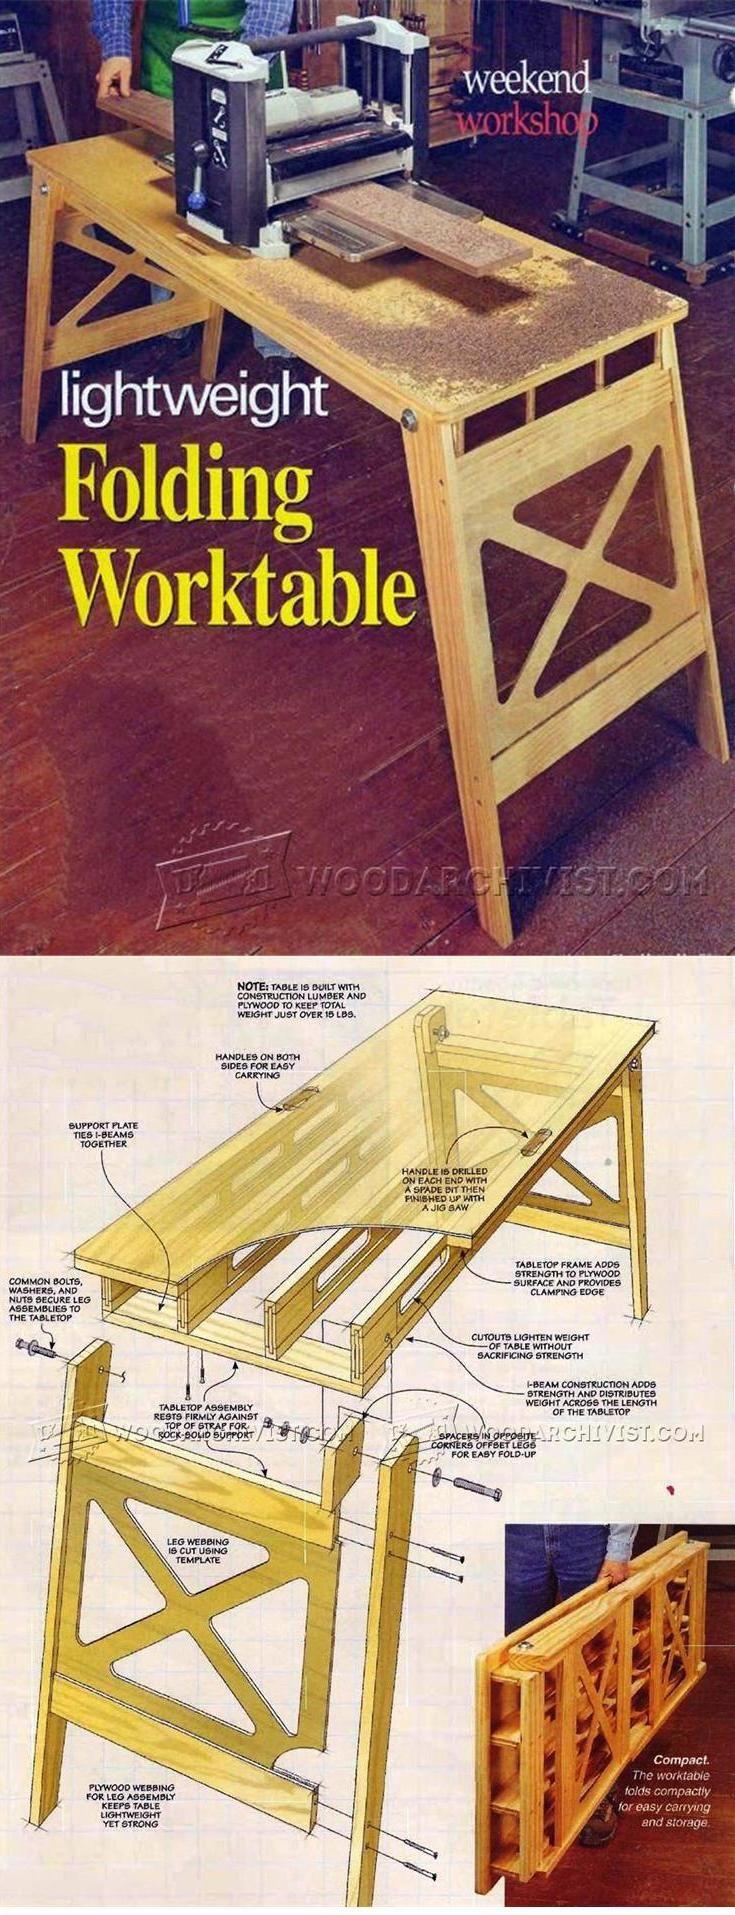 Folding Work Table Plans - Workshop Solutions Plans, Tips and Tricks   WoodArchivist.com